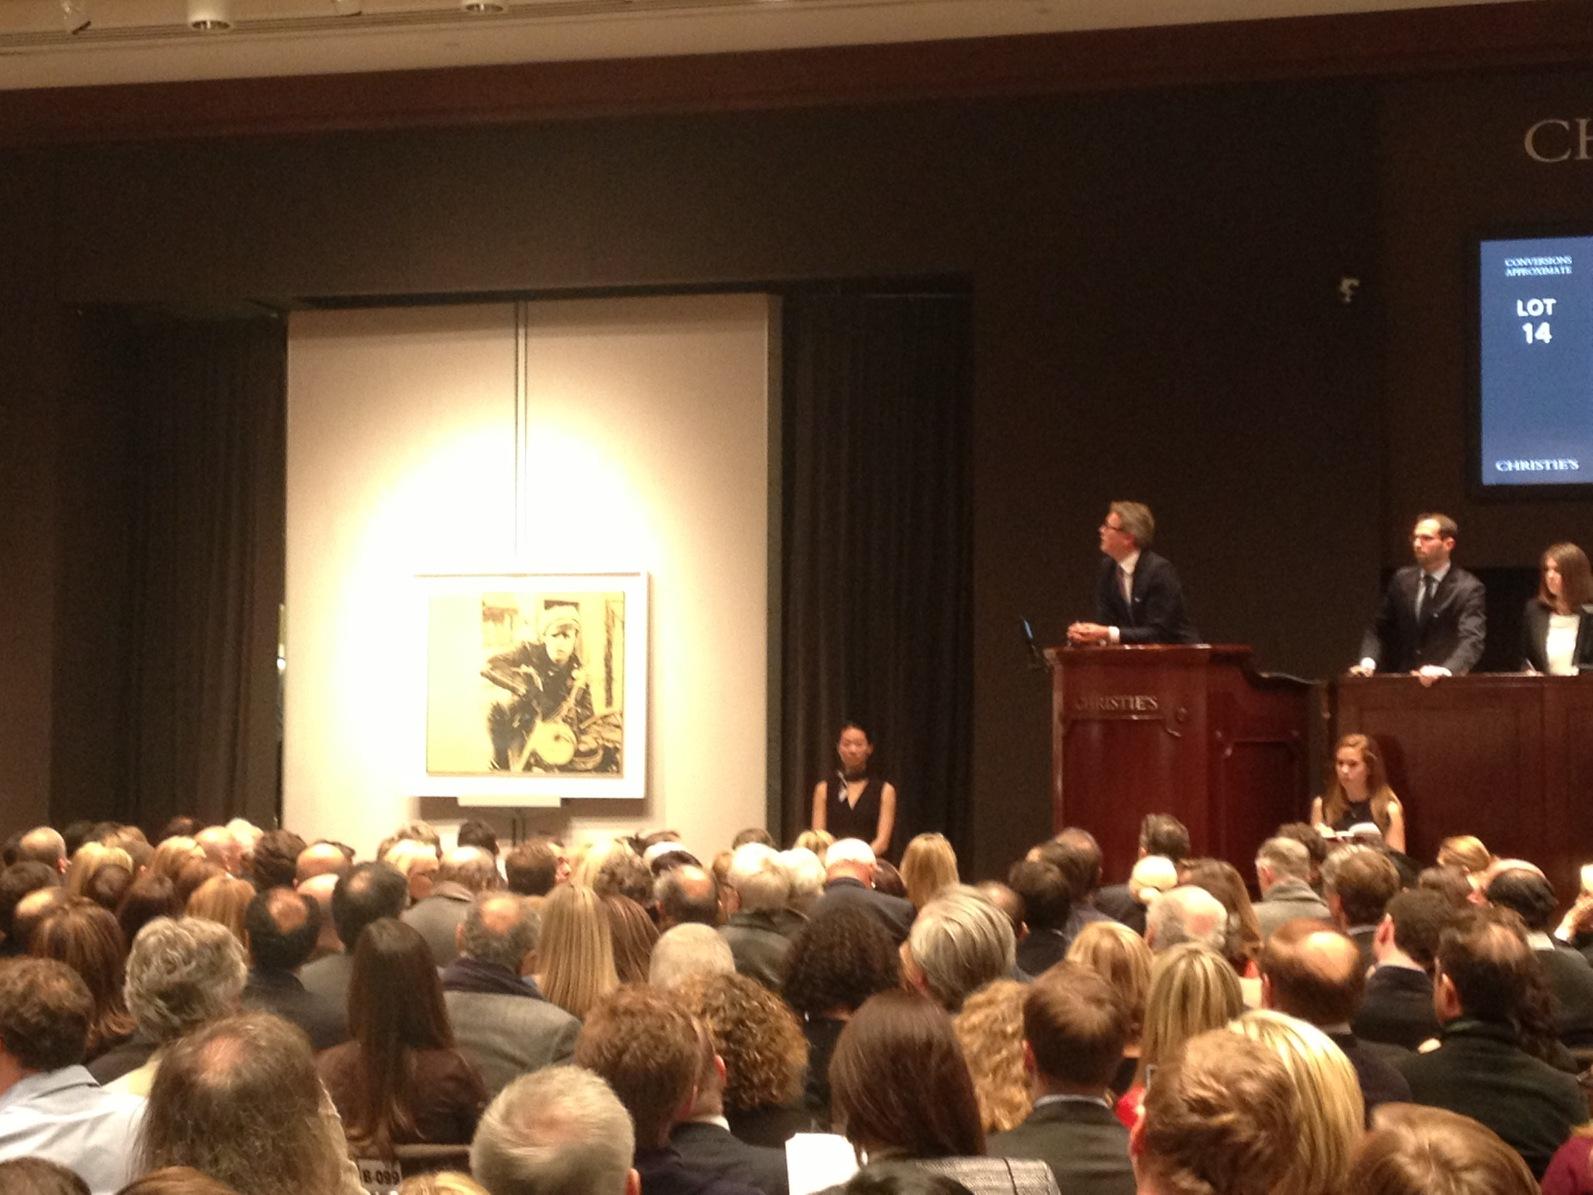 Christie's Sale Room, via Art Observed